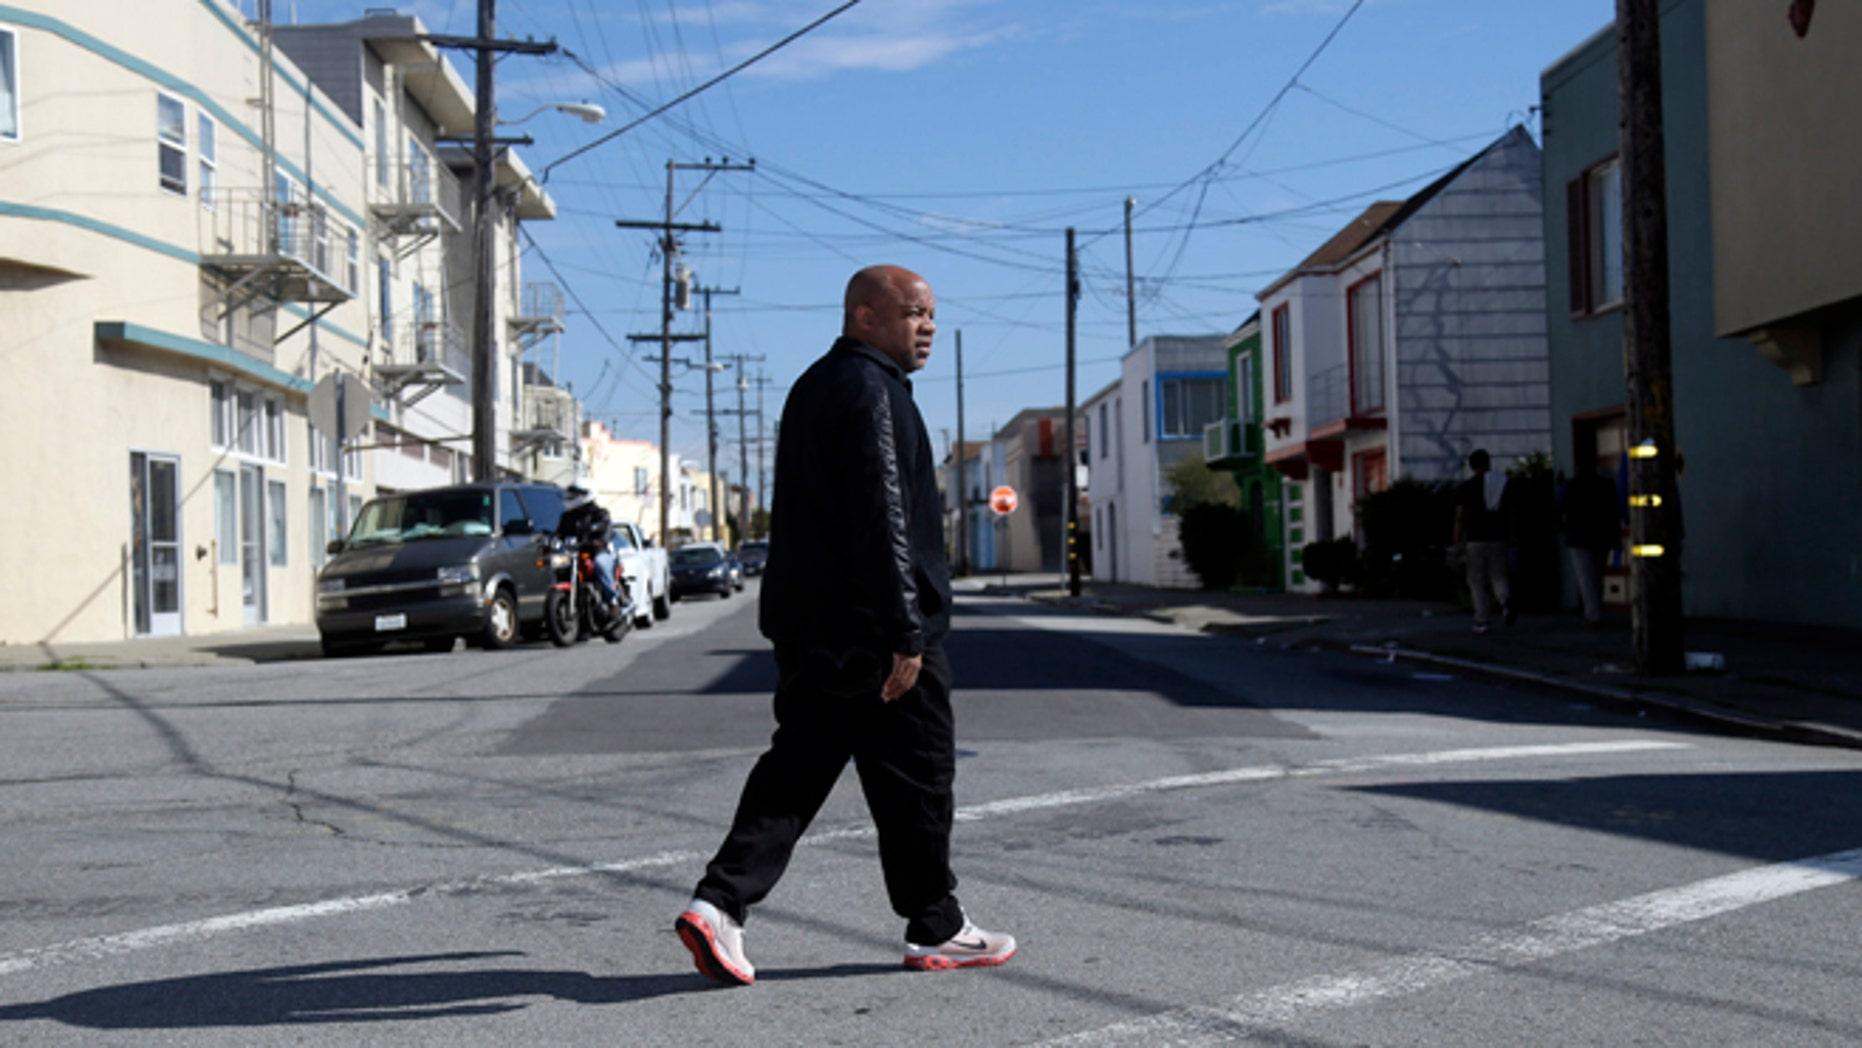 Feb. 13, 2014: Ernest Morgan walks around his neighborhood in San Francisco.